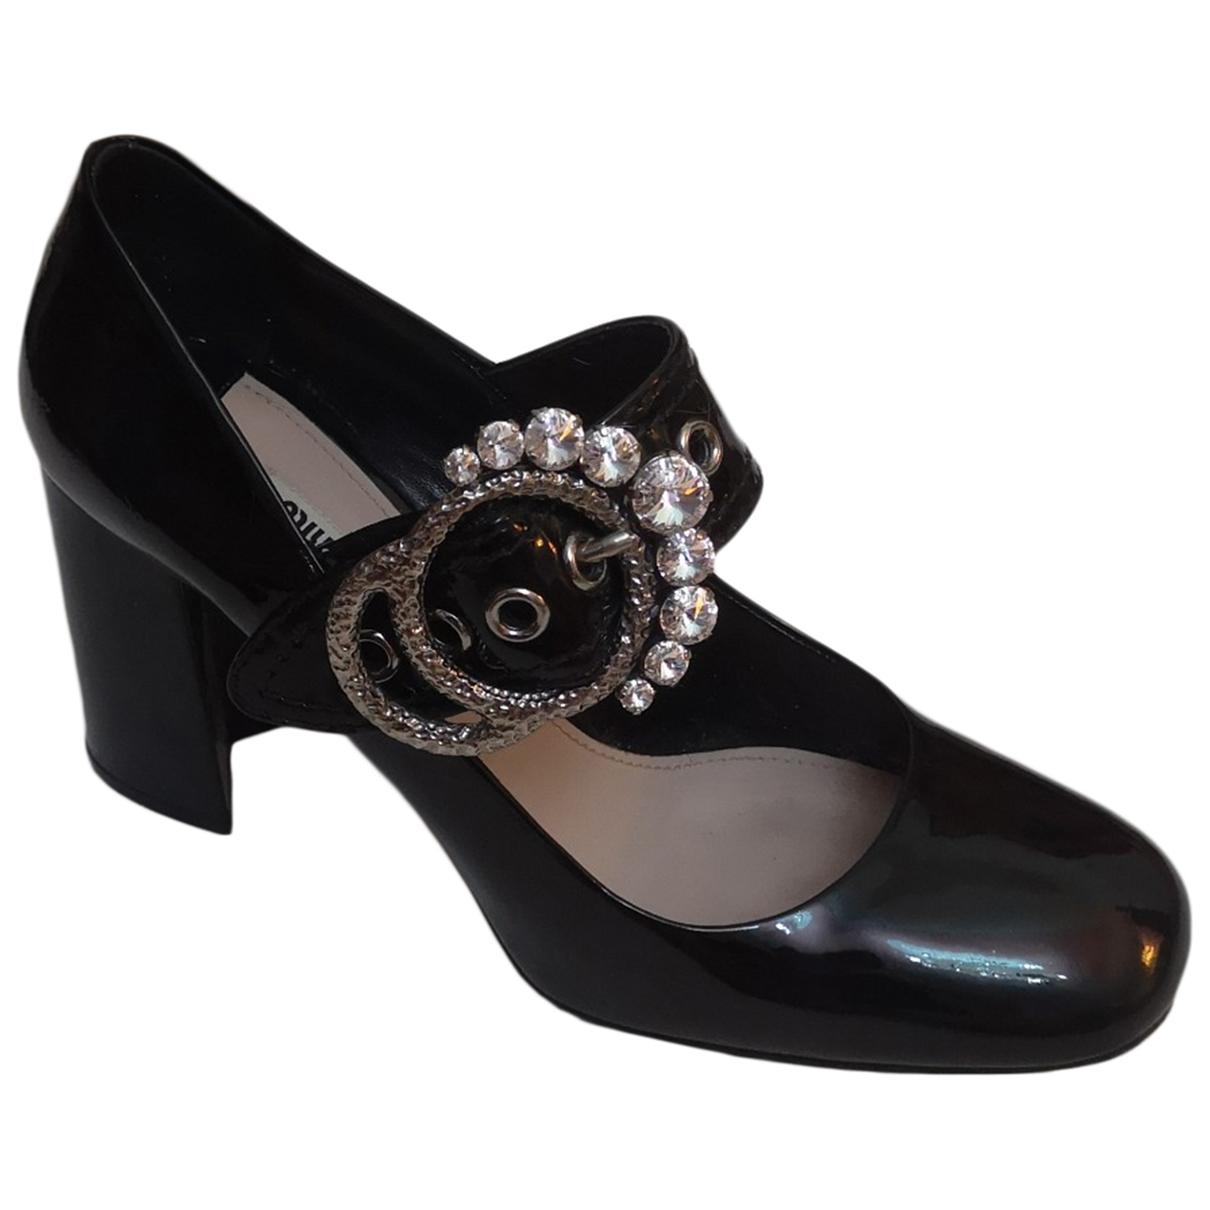 Miu Miu N Black Leather Heels for Women 41 EU